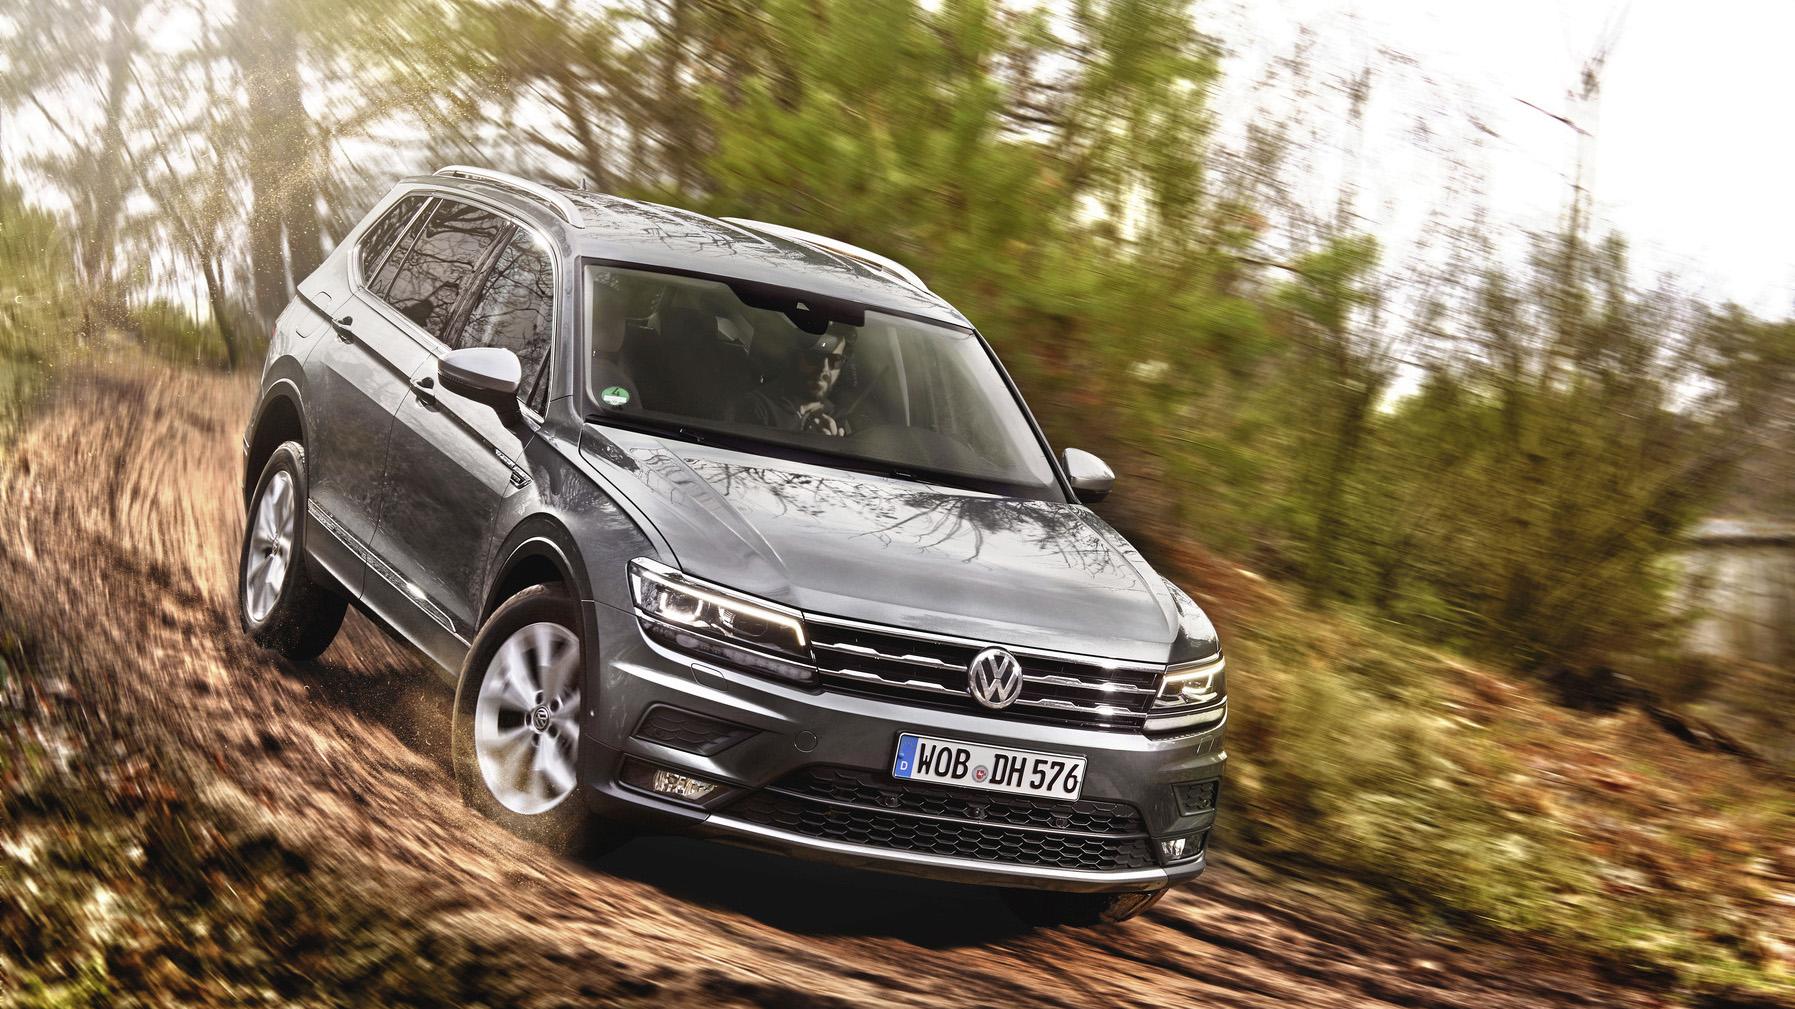 Volkswagen Tiguan 產量破 600 萬輛,全車系適用彈性保養概念